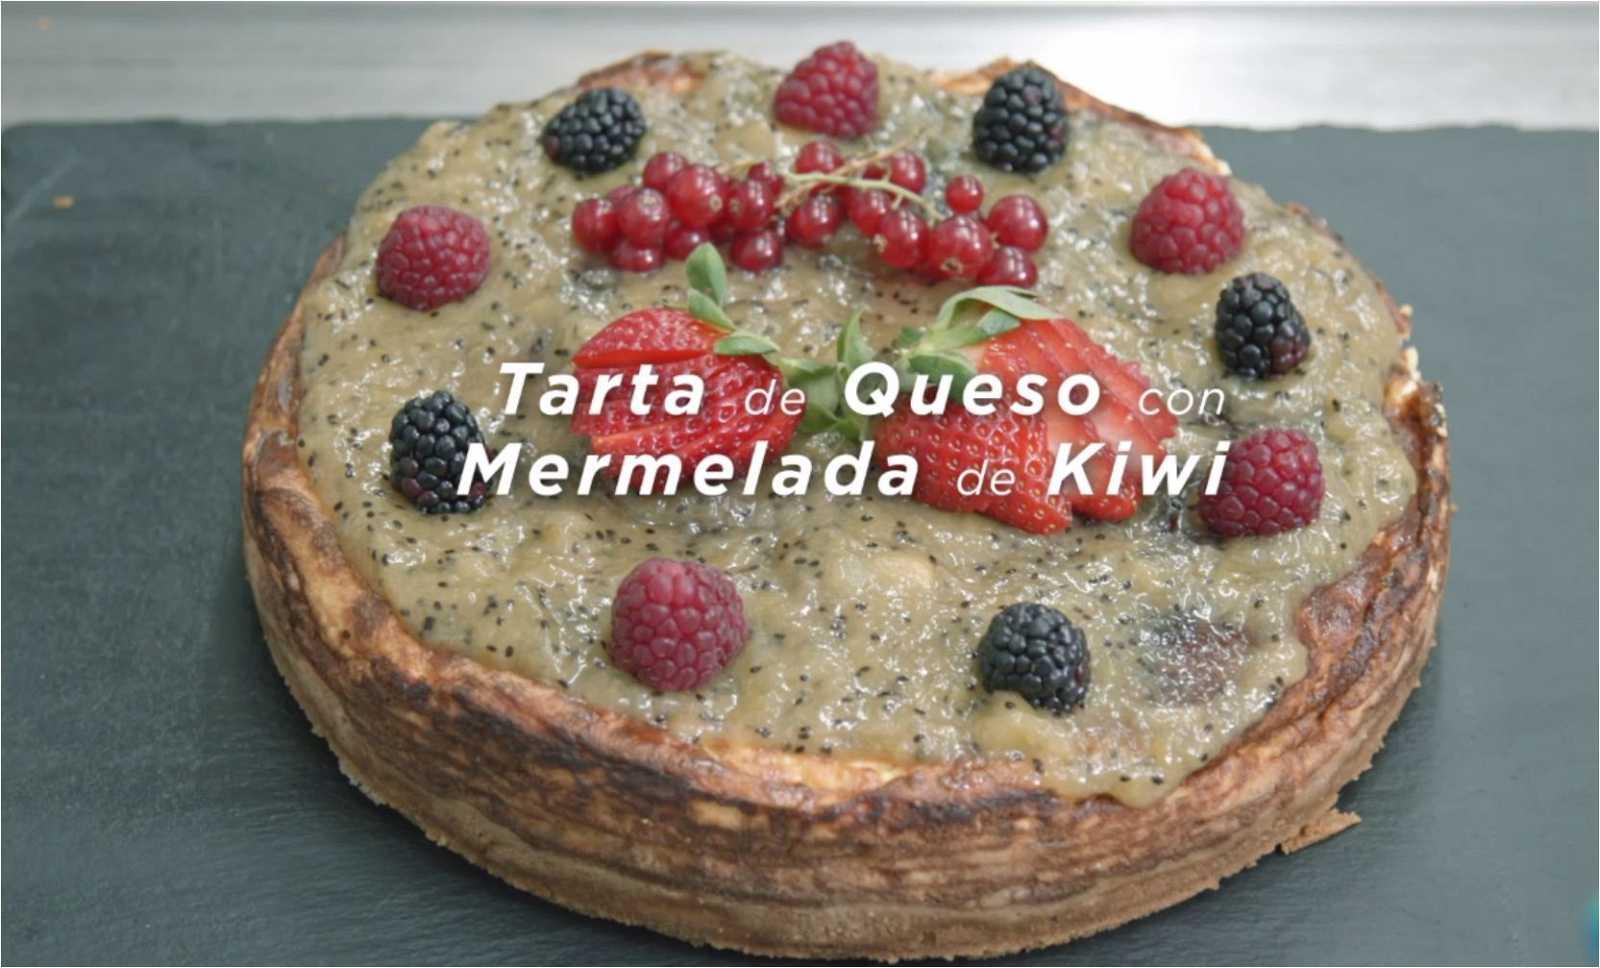 La ciencia de la salud - Tarta de queso con mermelada de kiwi